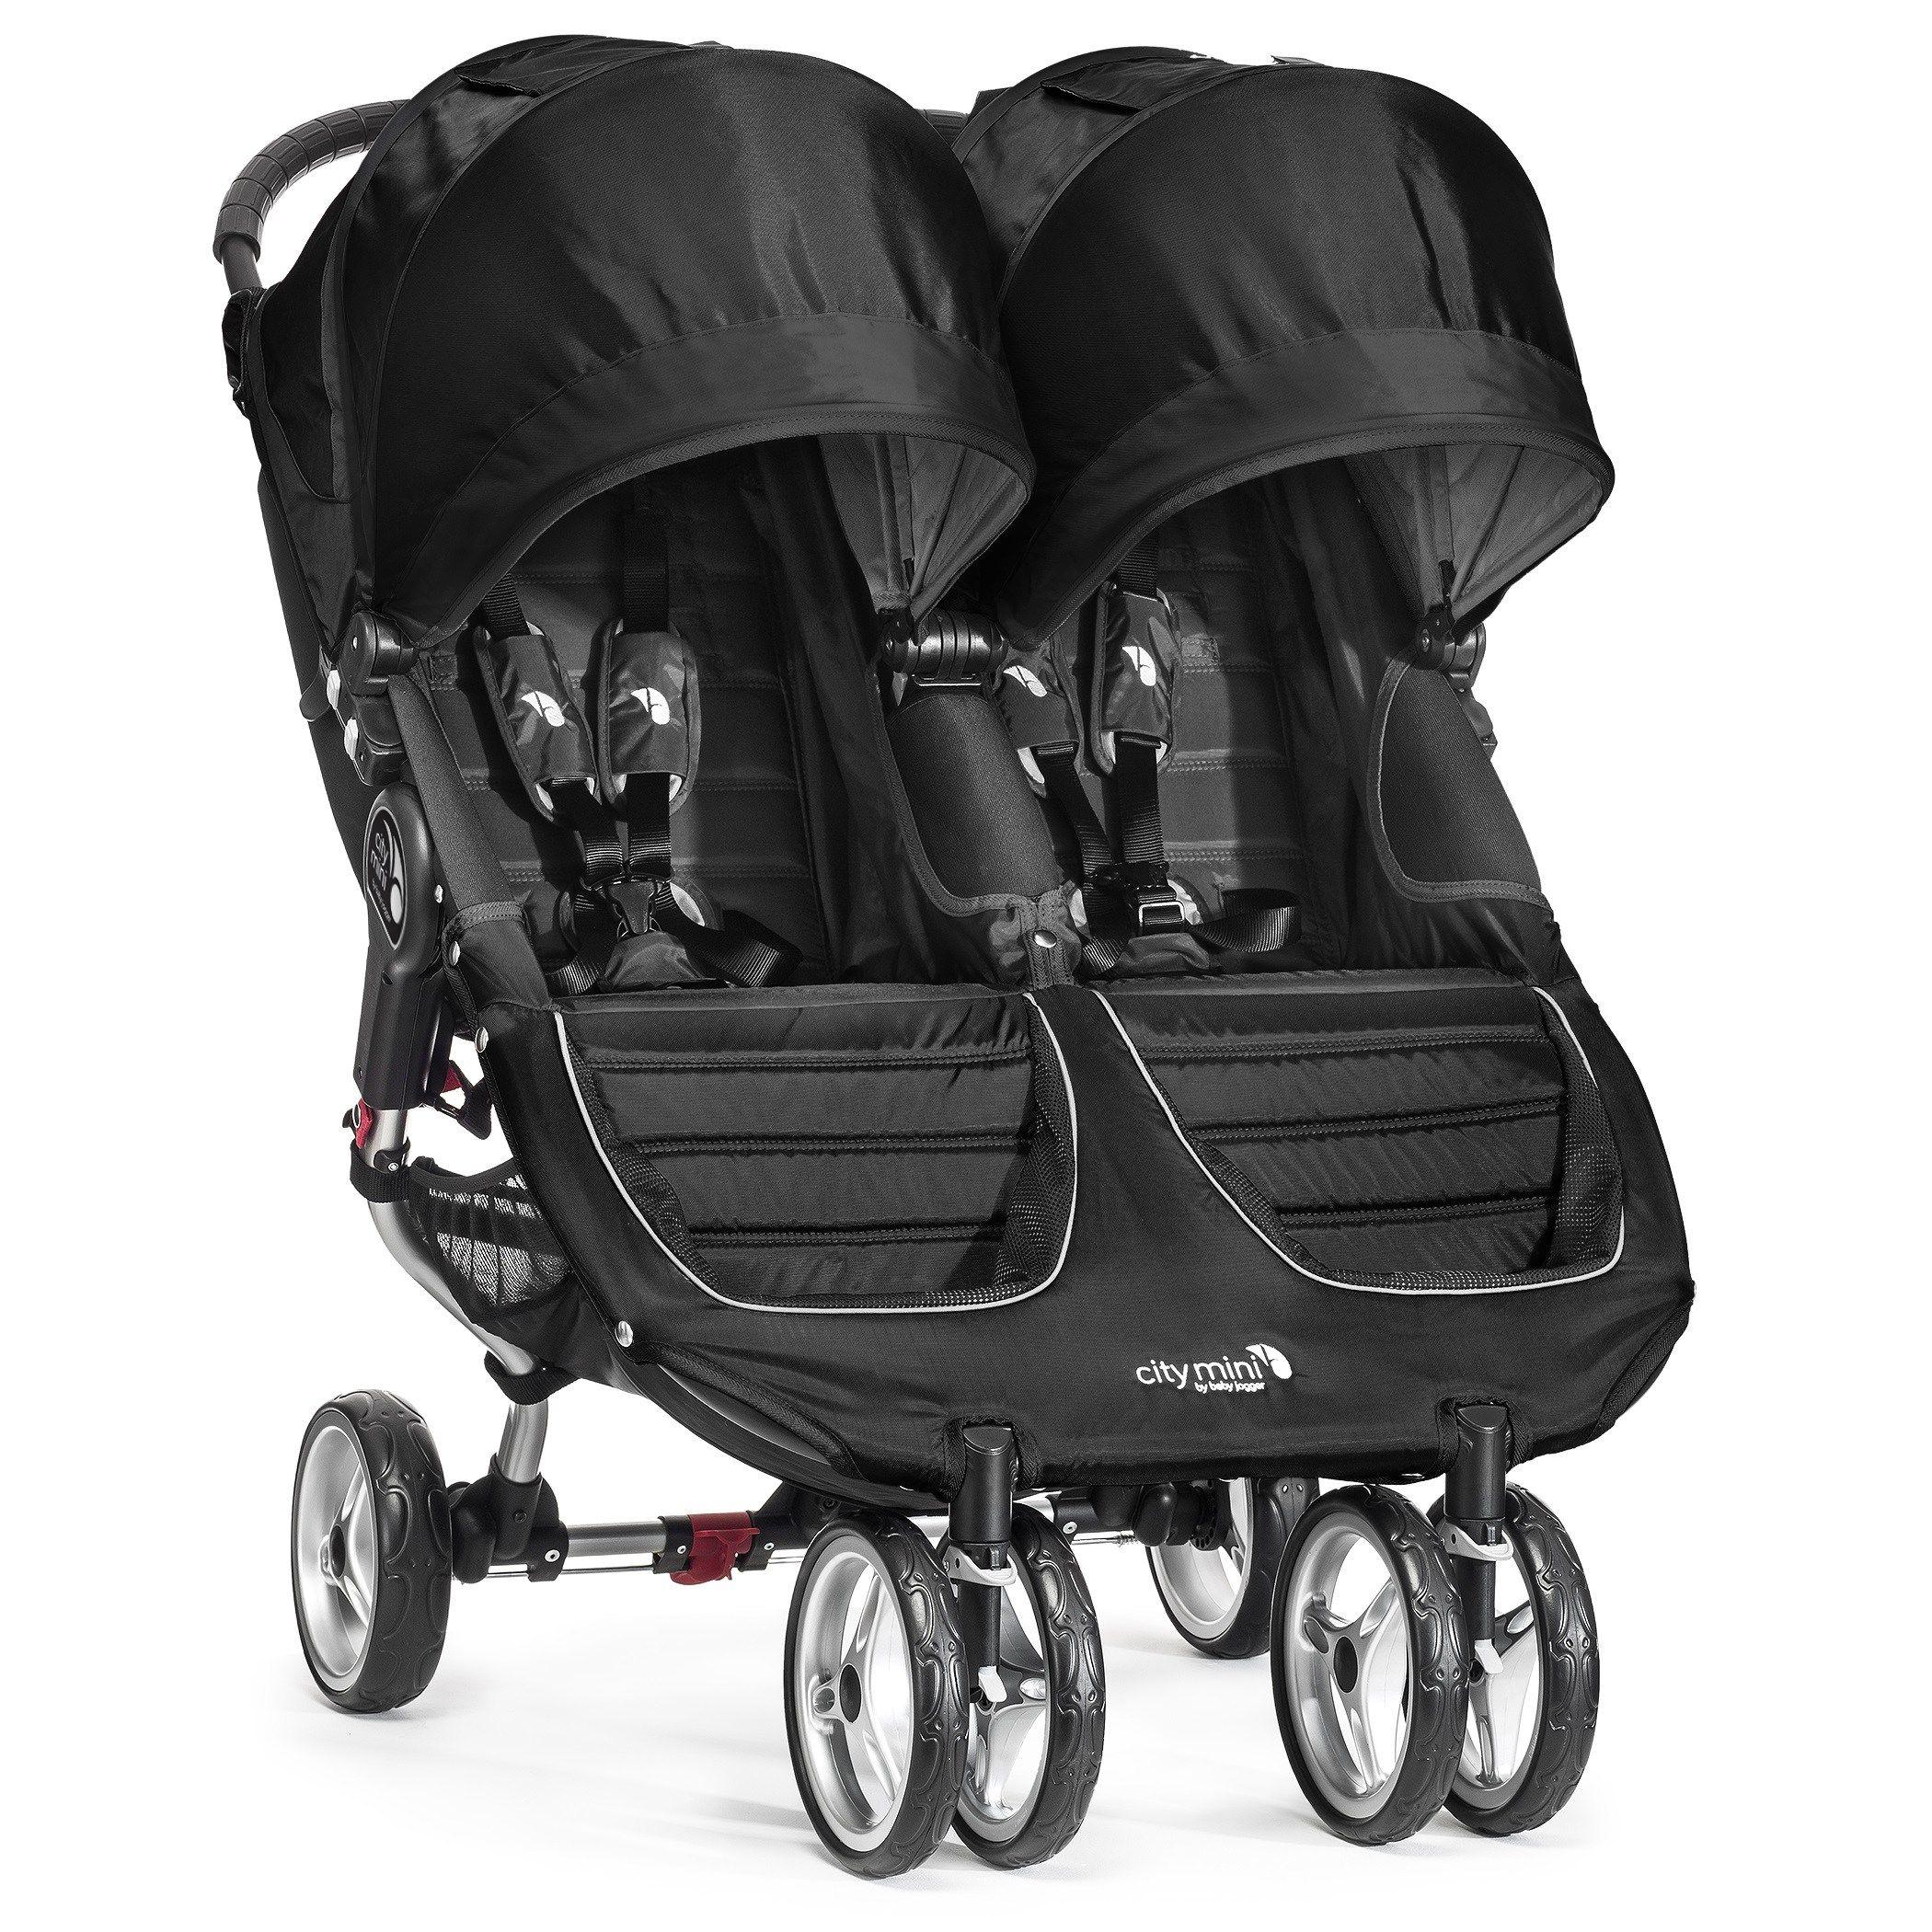 Tandem vs. SidebySide Double Stroller Baby jogger city